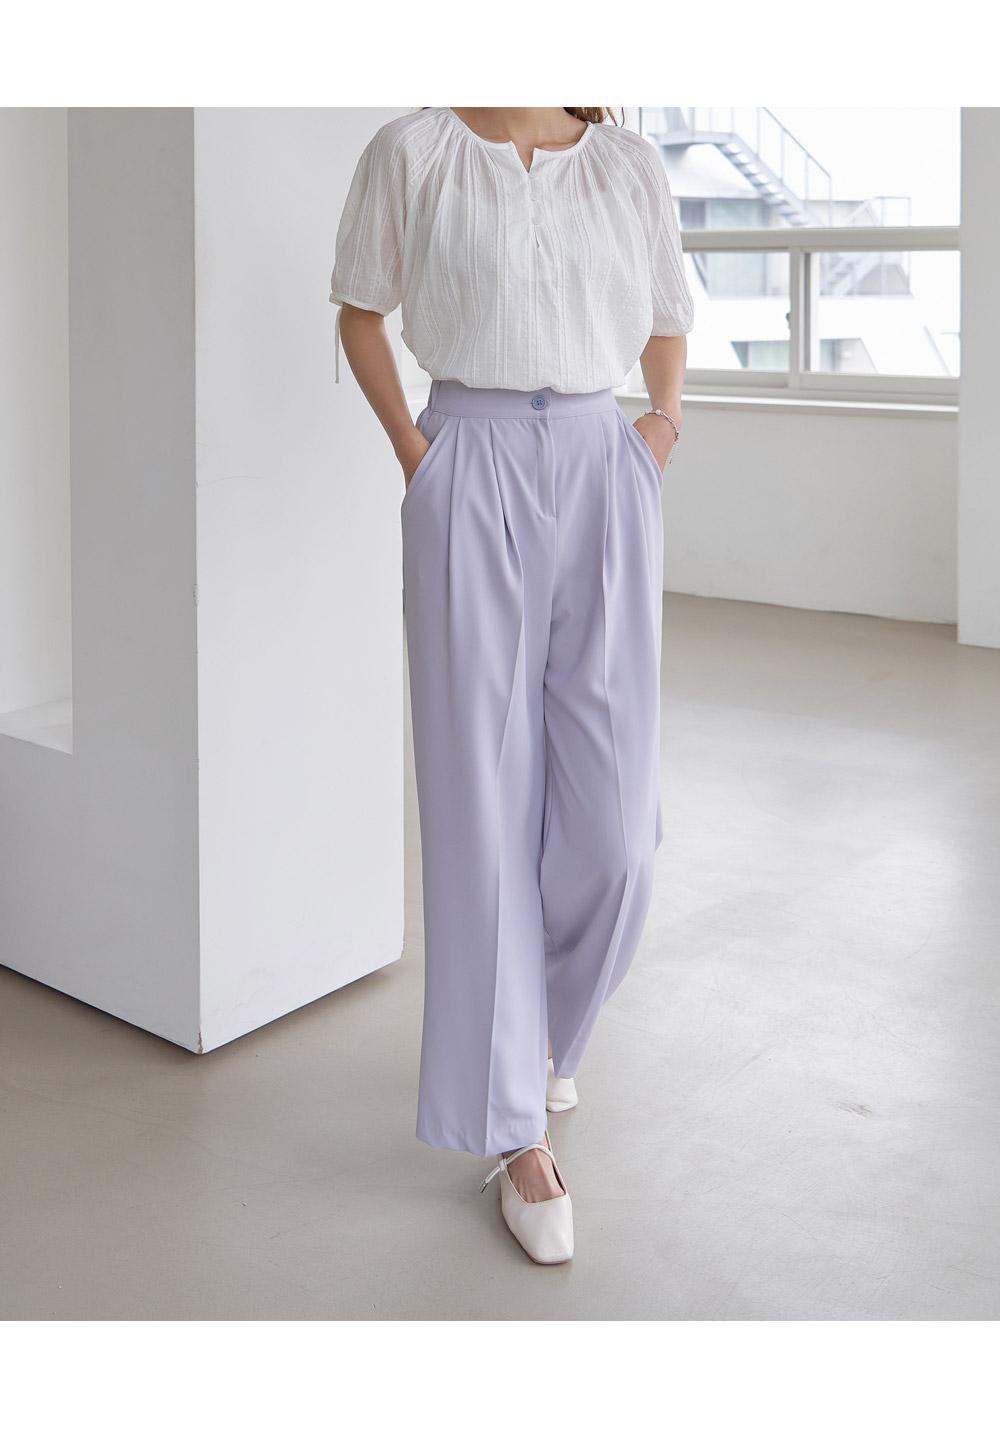 Closy Raglan blouse